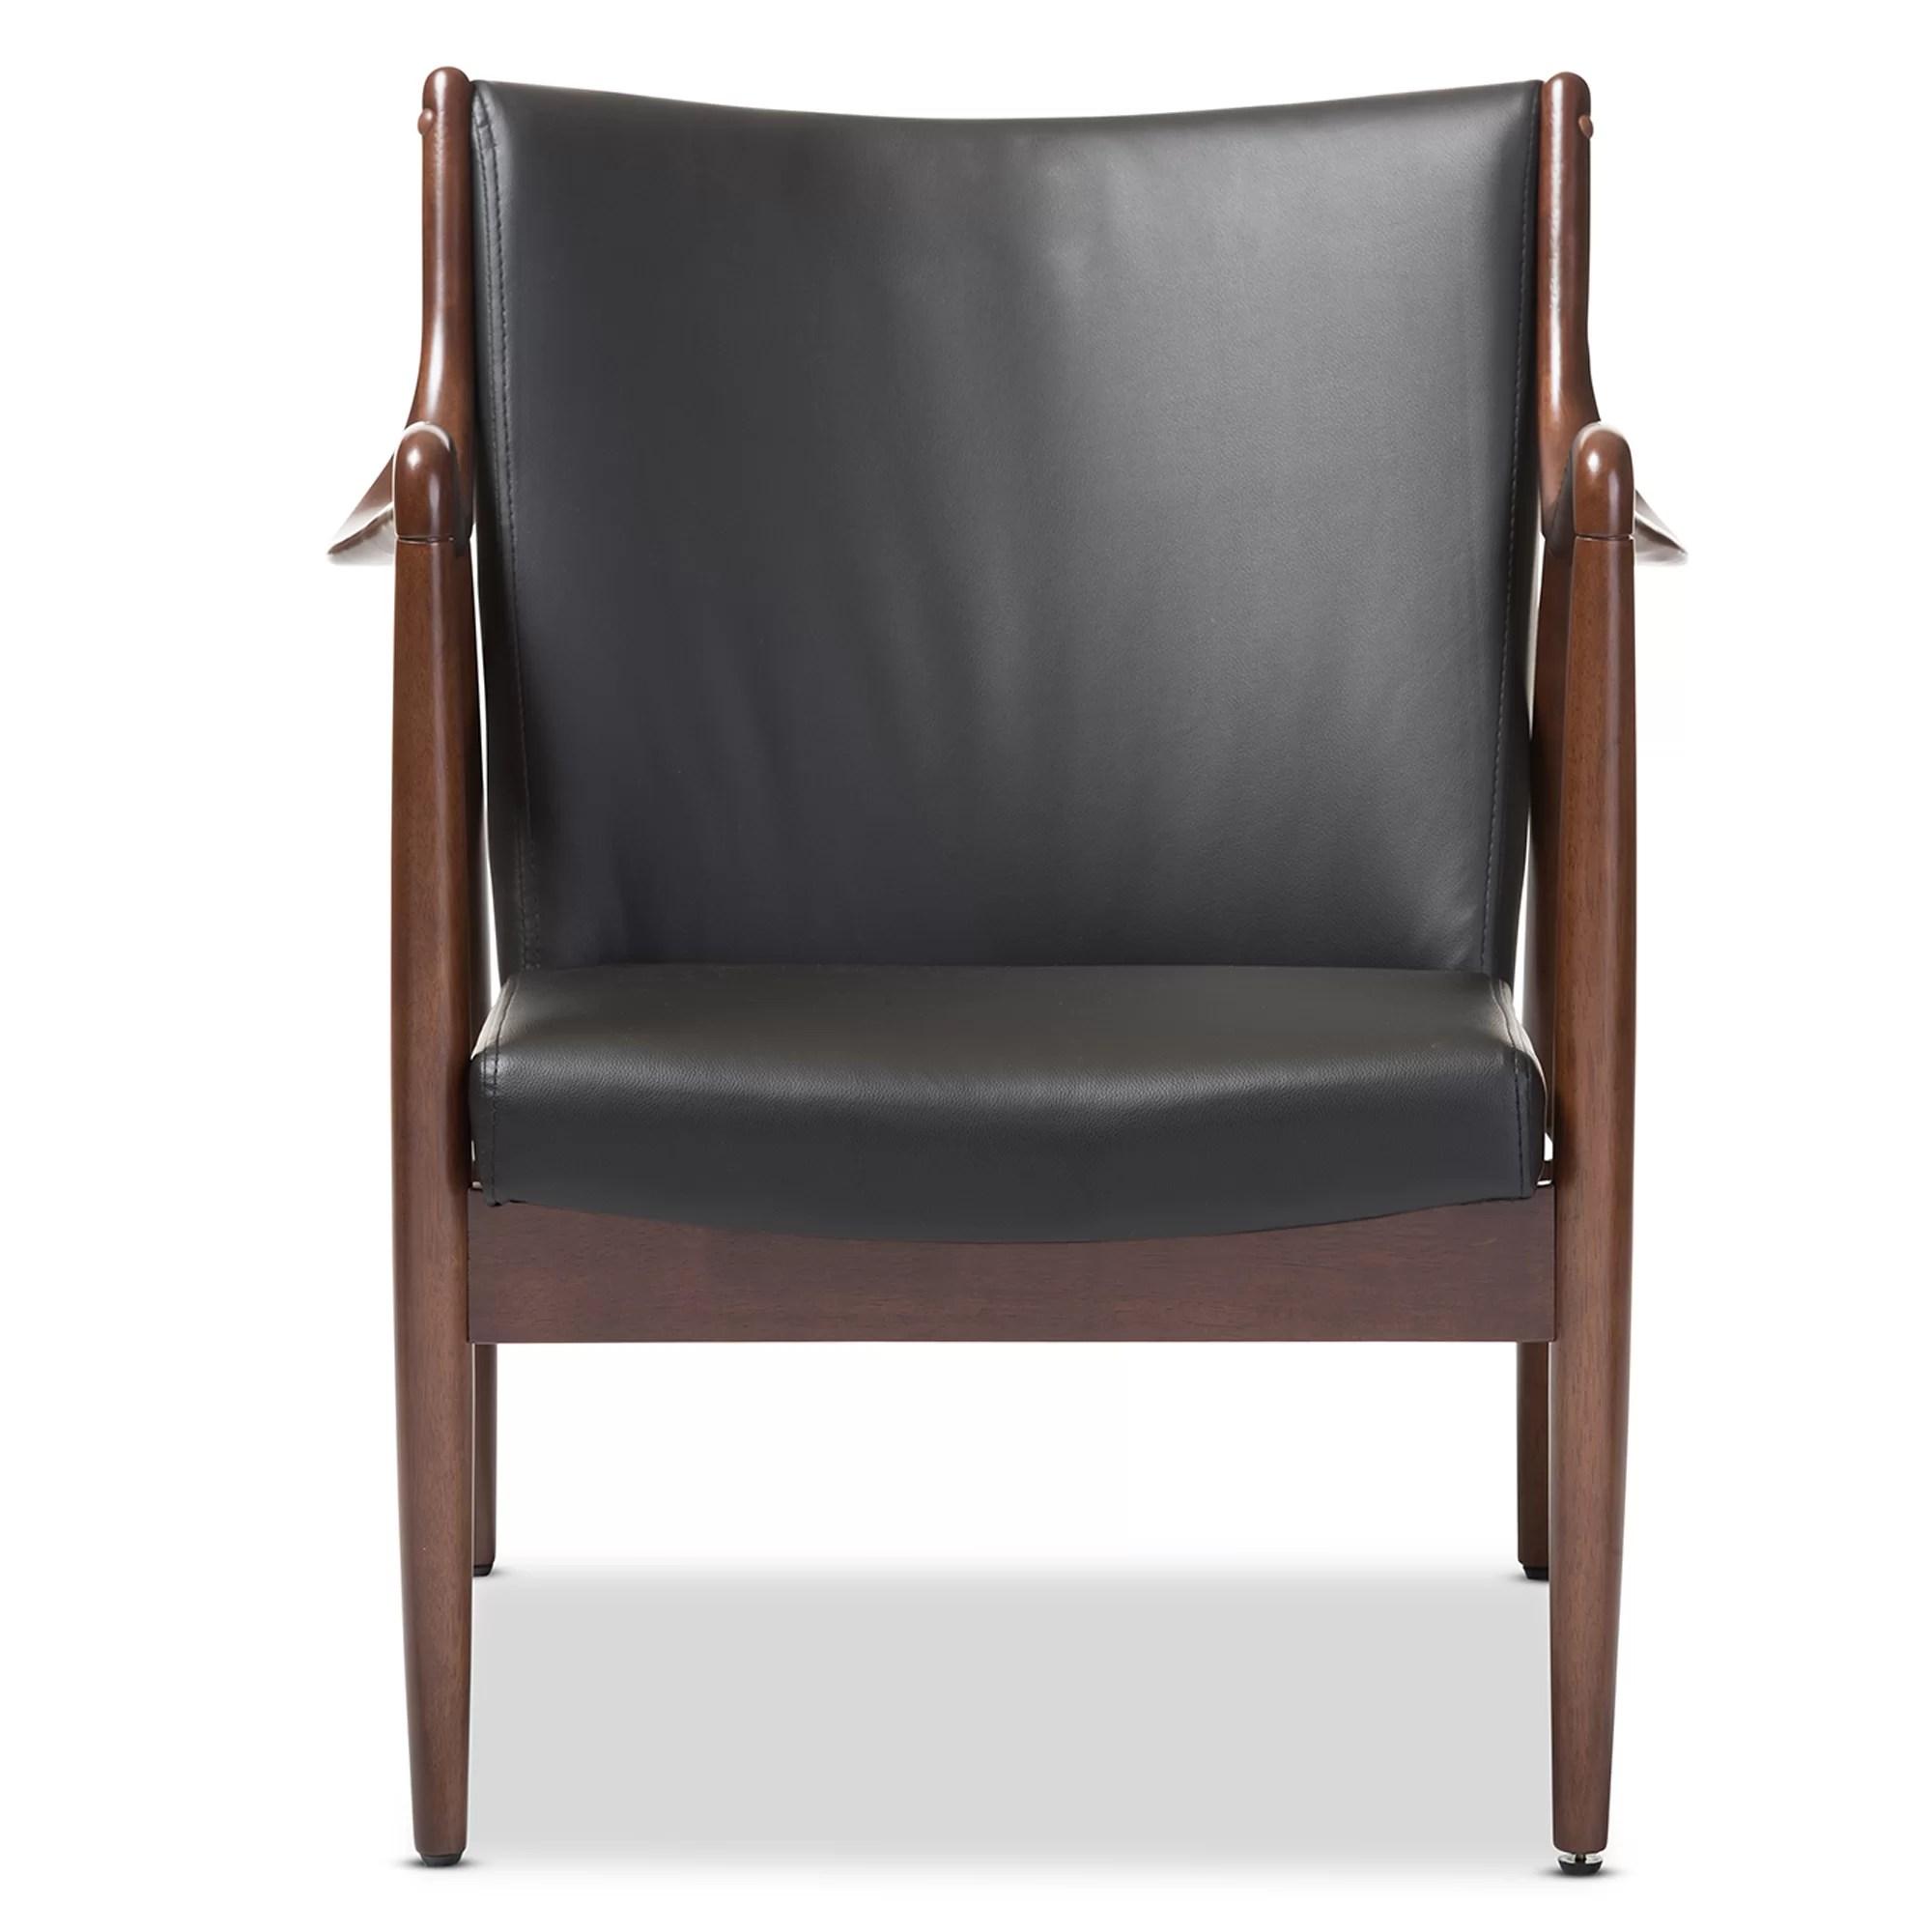 modern wood chair baby rocking walmart wholesale interiors shakespeare leisure lounge